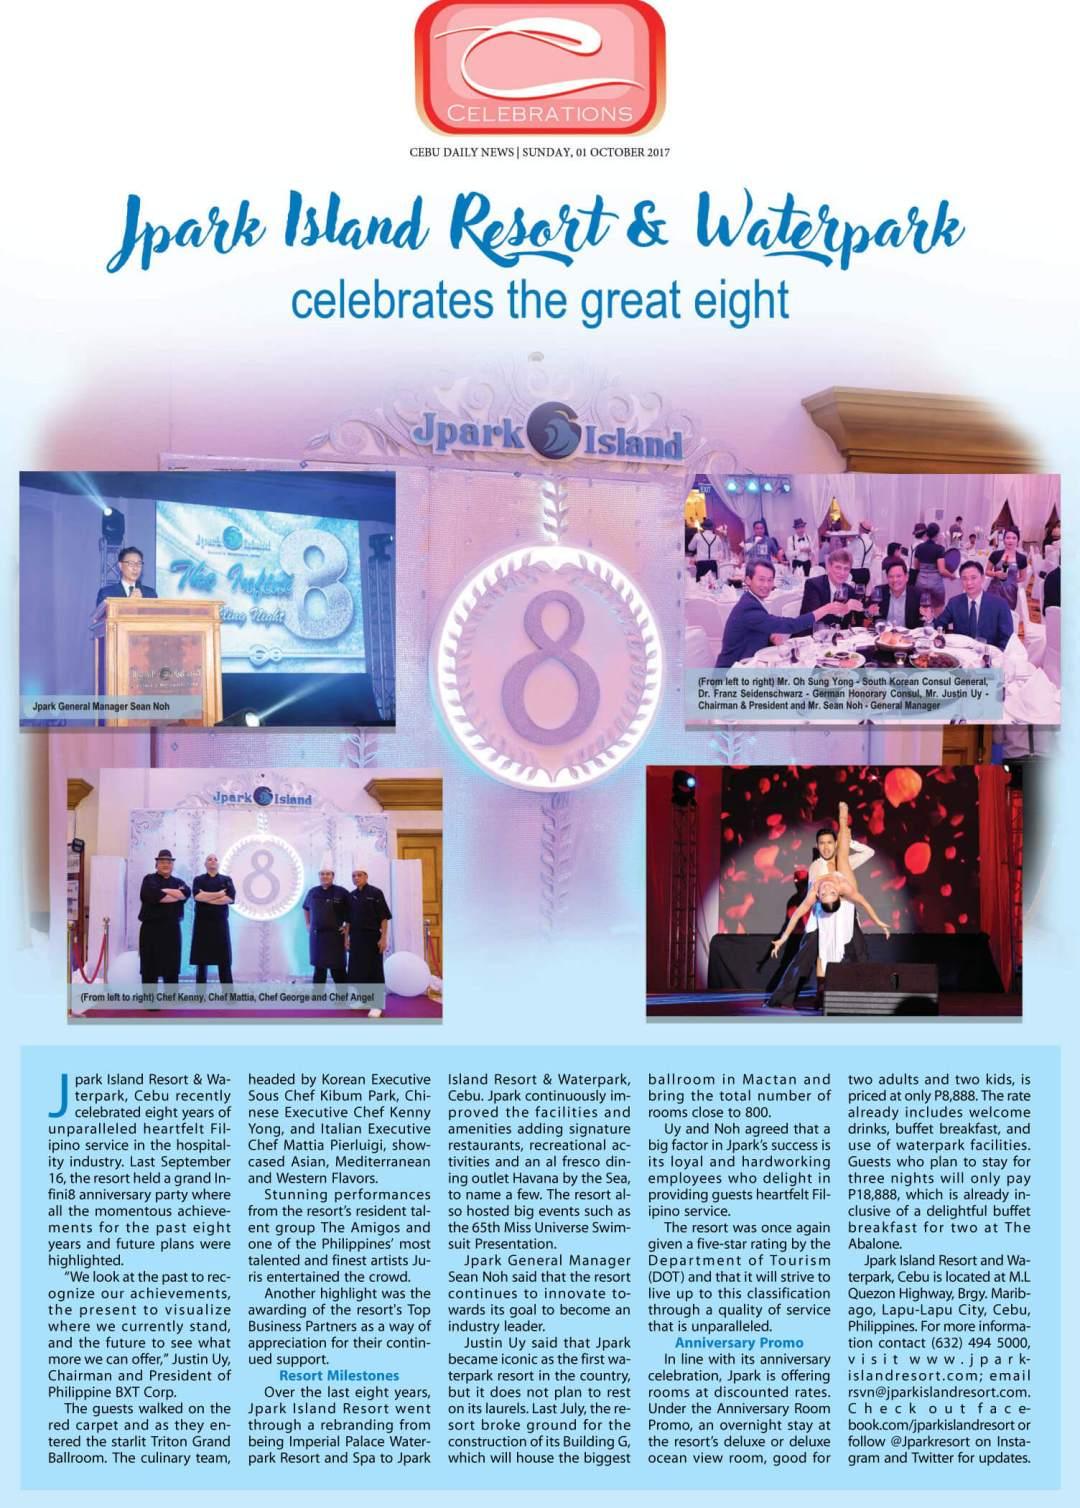 A Festive Chinese New Year Celebration at Jpark Island Resort